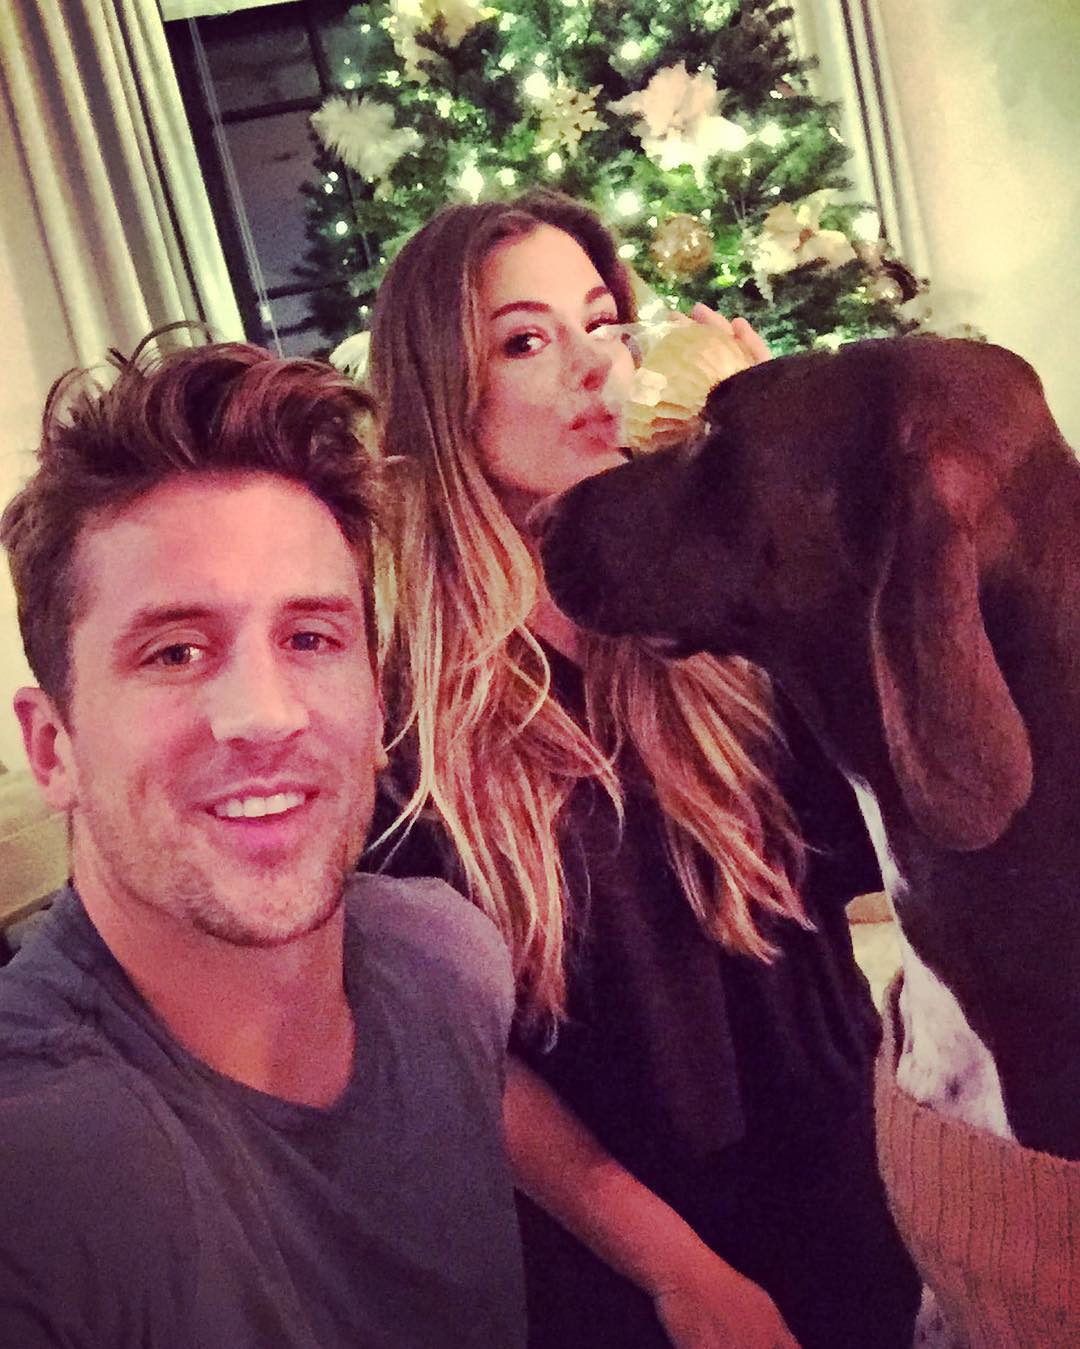 JoJo Fletcher, Jordan Rodgers Buy First Christmas Tree as Couple